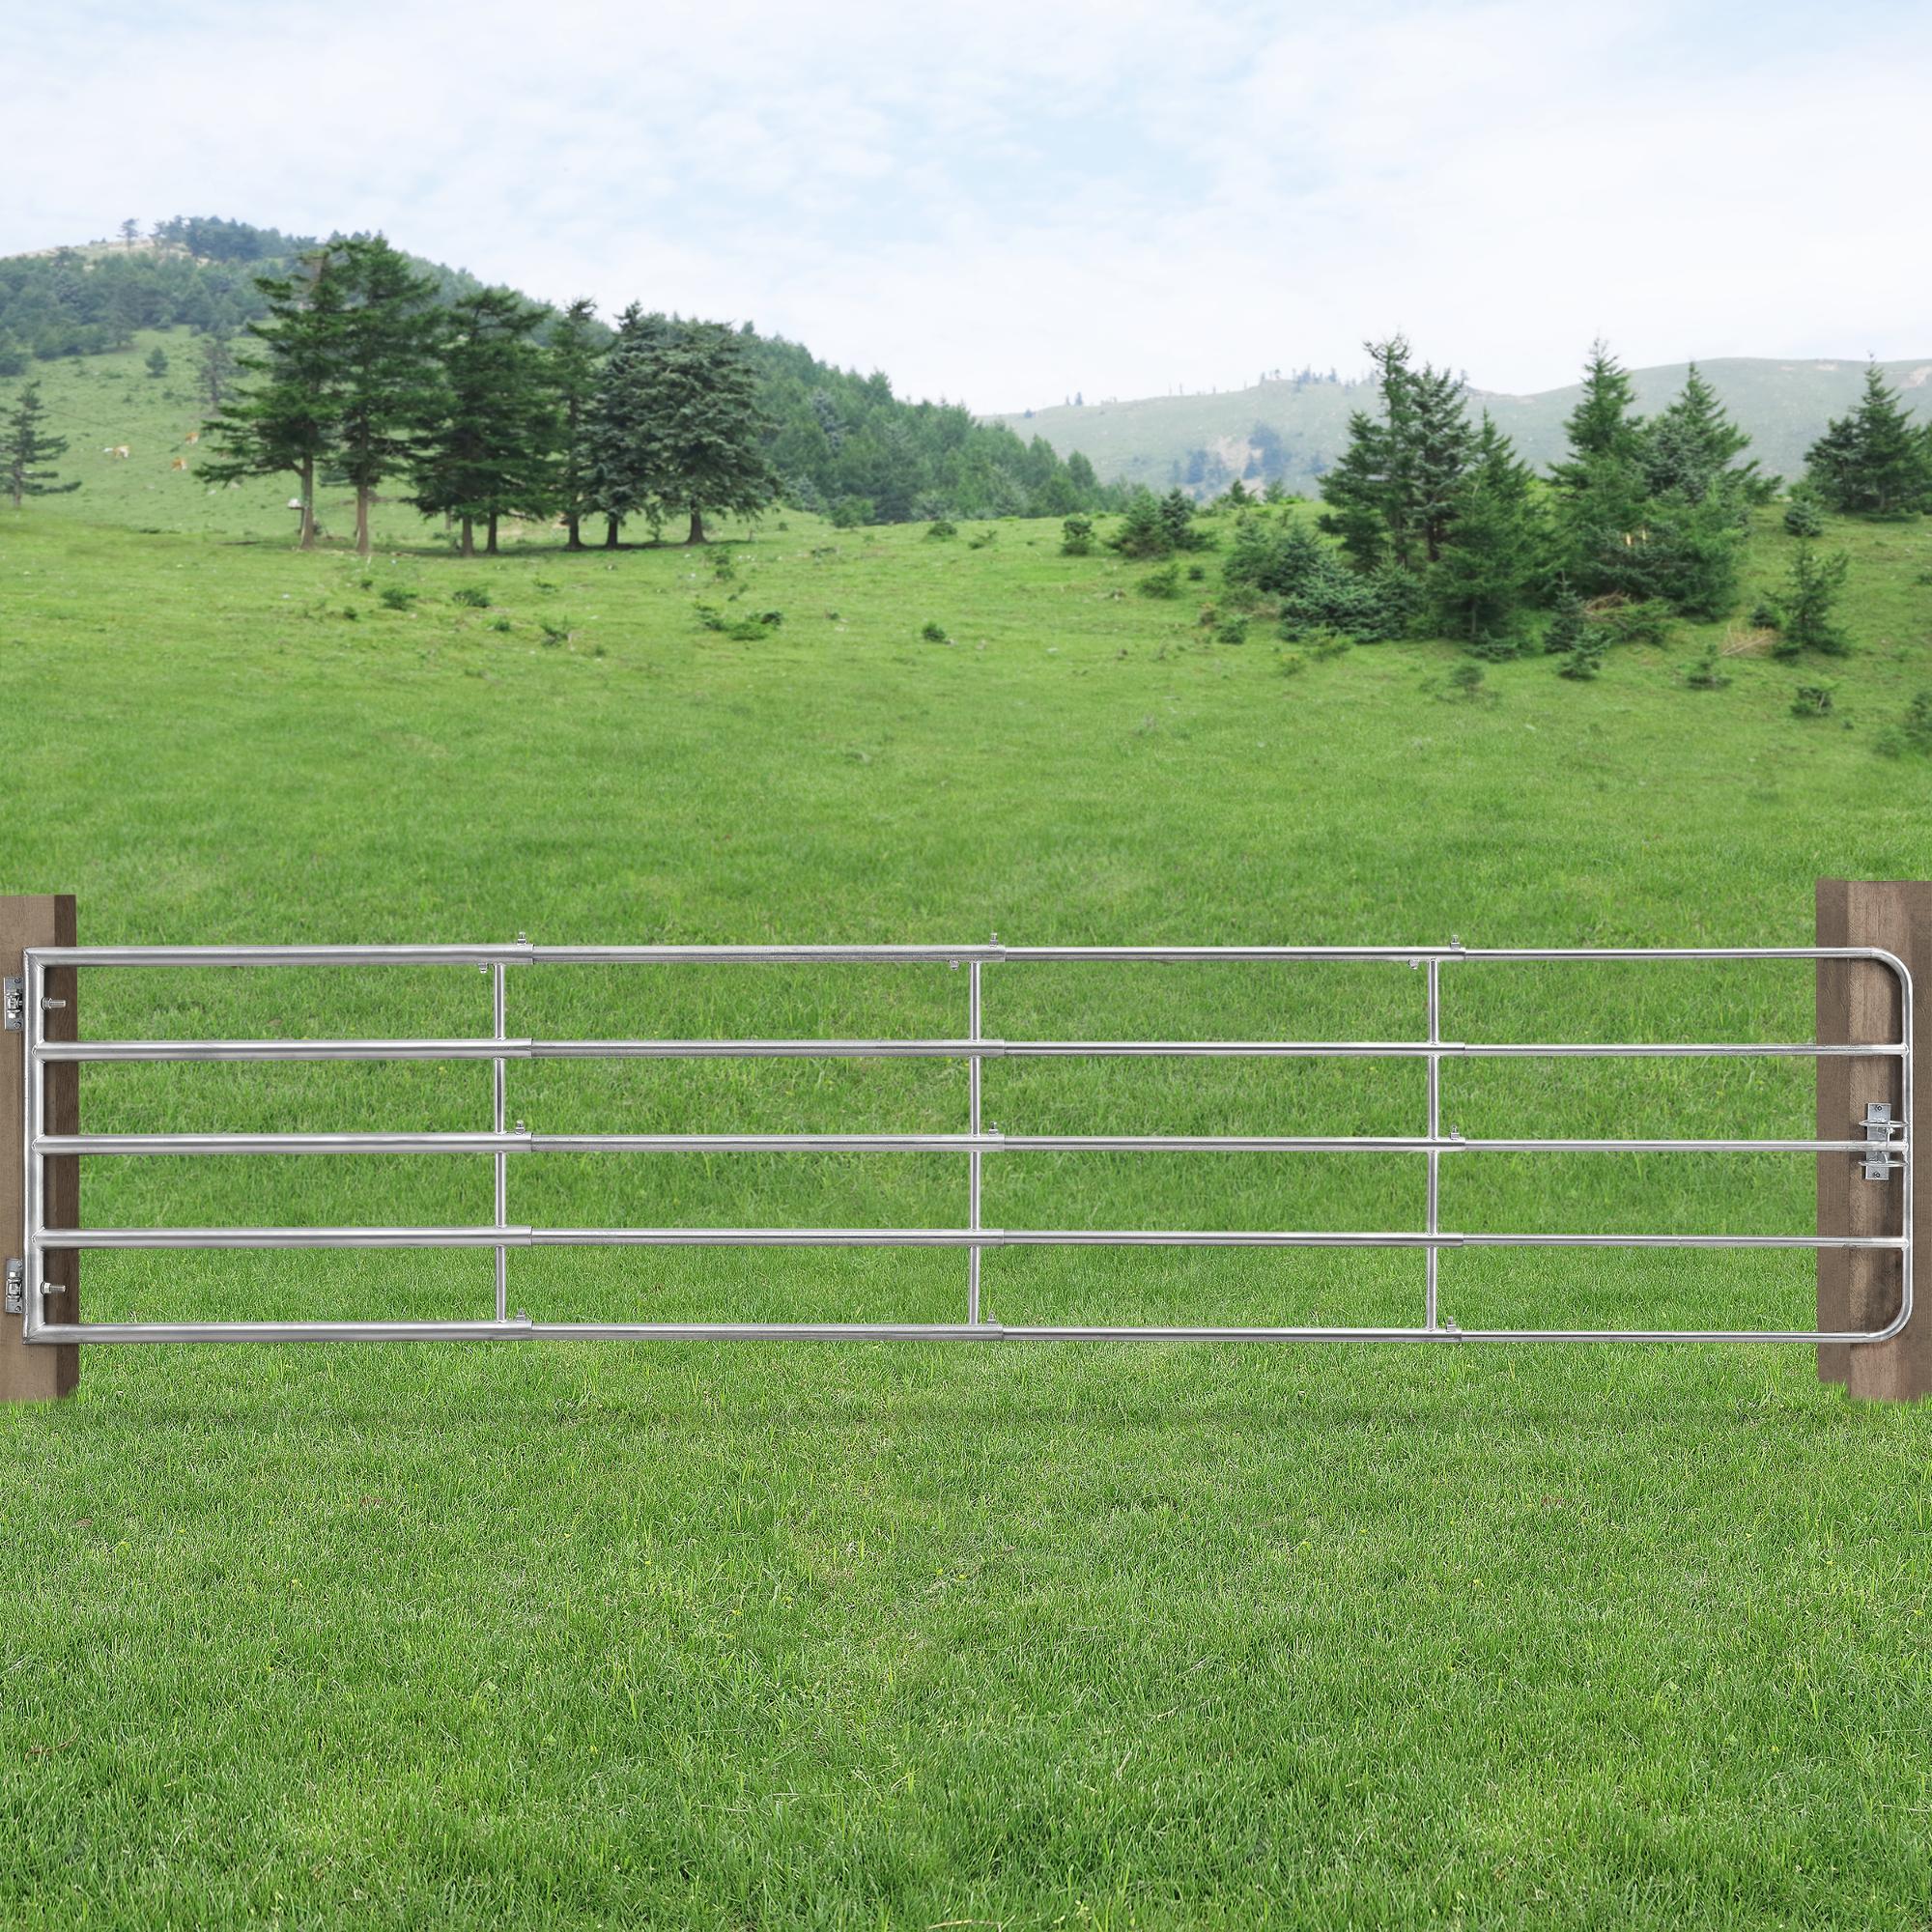 20x Kunststoffpfähle 155cm Steigbügel grün Weidezaunpfahl Elektrozaun Pferd Pony